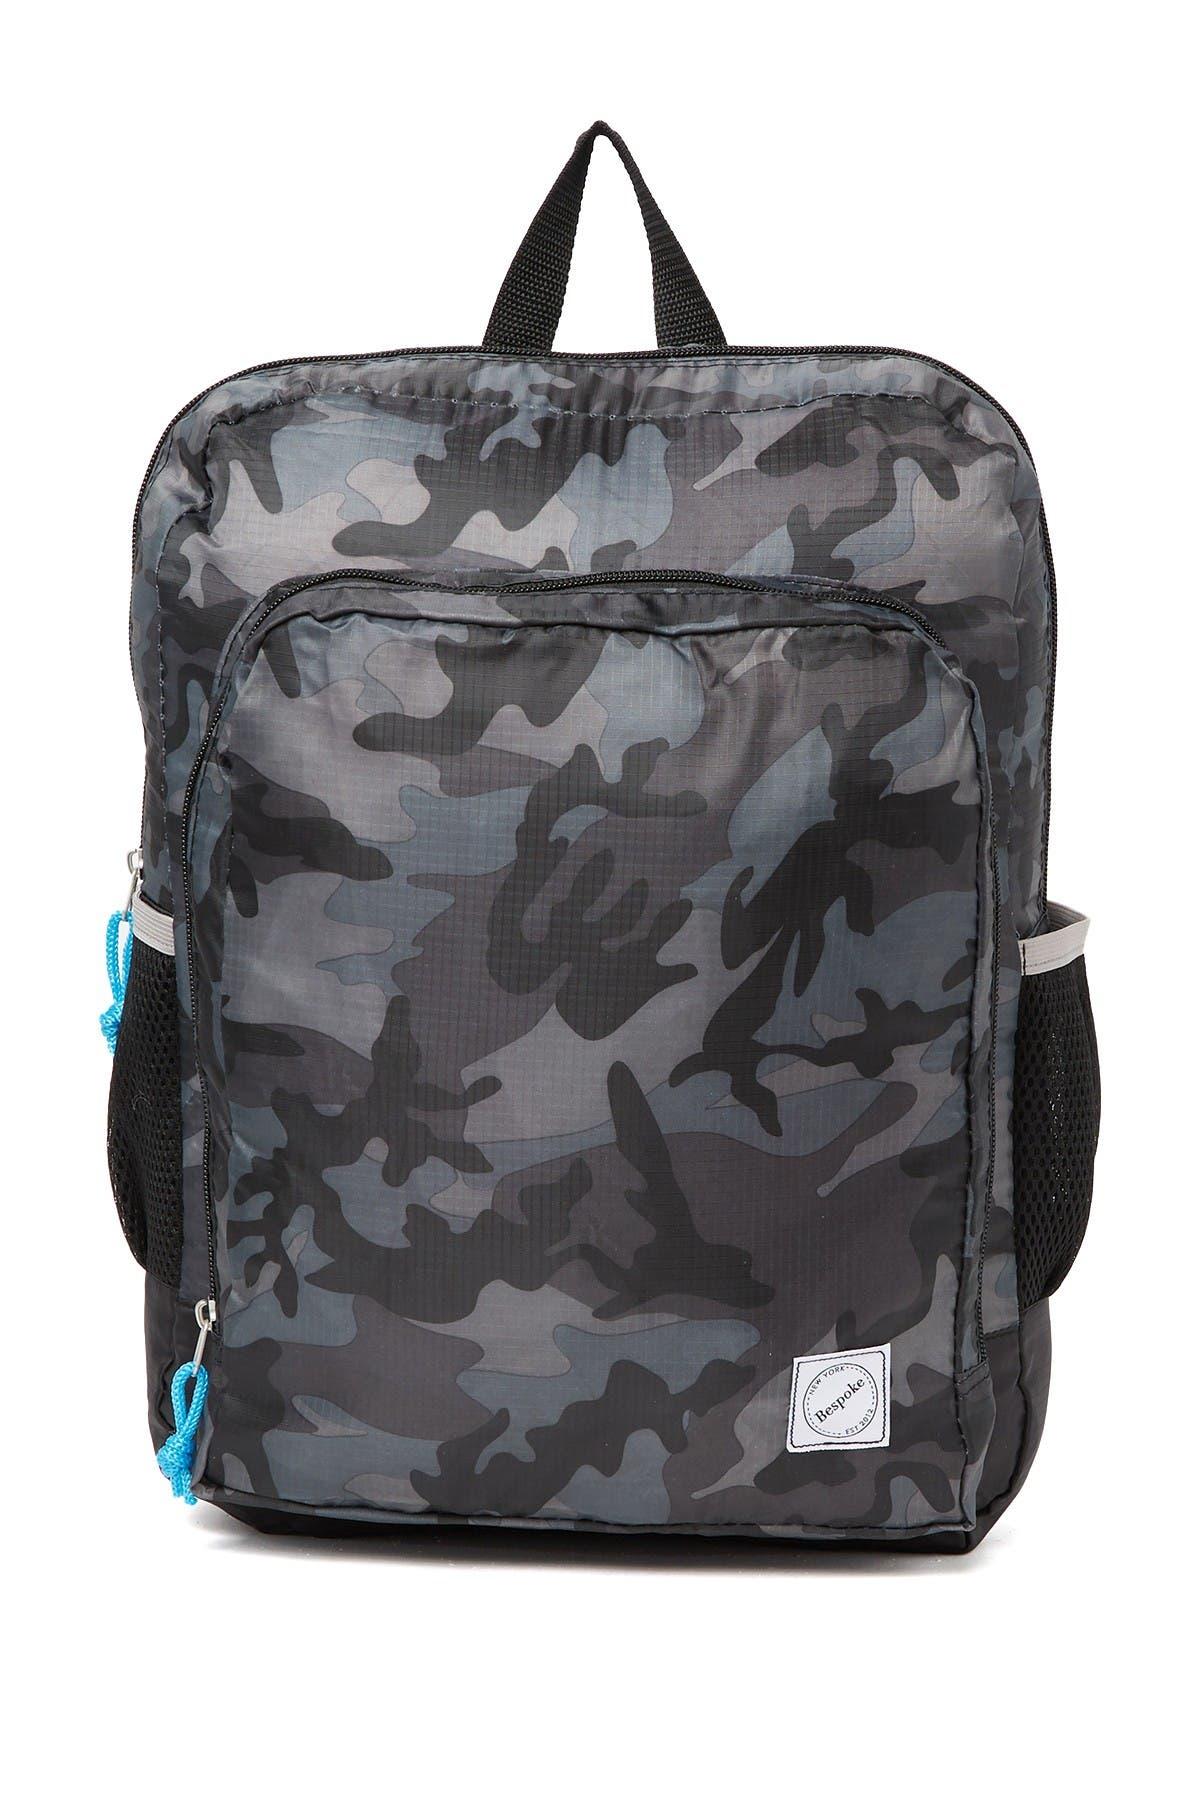 Image of Bespoke Black Camo Packable Backpack